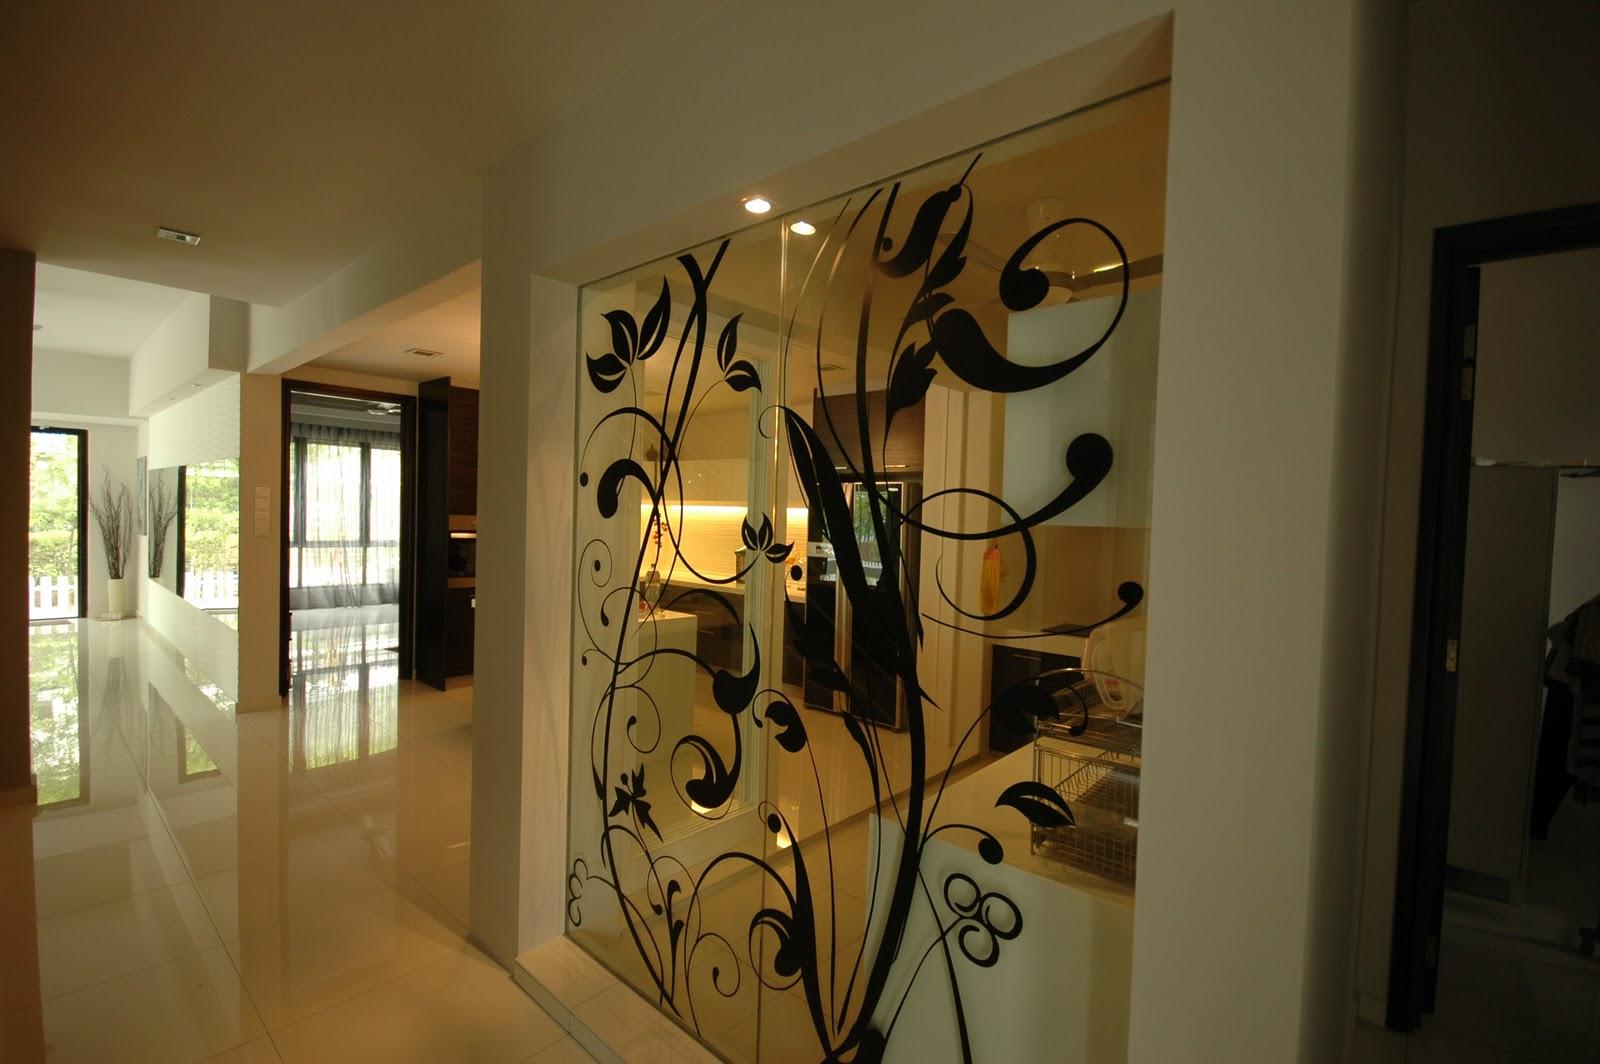 hauz completion ground floor wet kitchen with decal. Black Bedroom Furniture Sets. Home Design Ideas